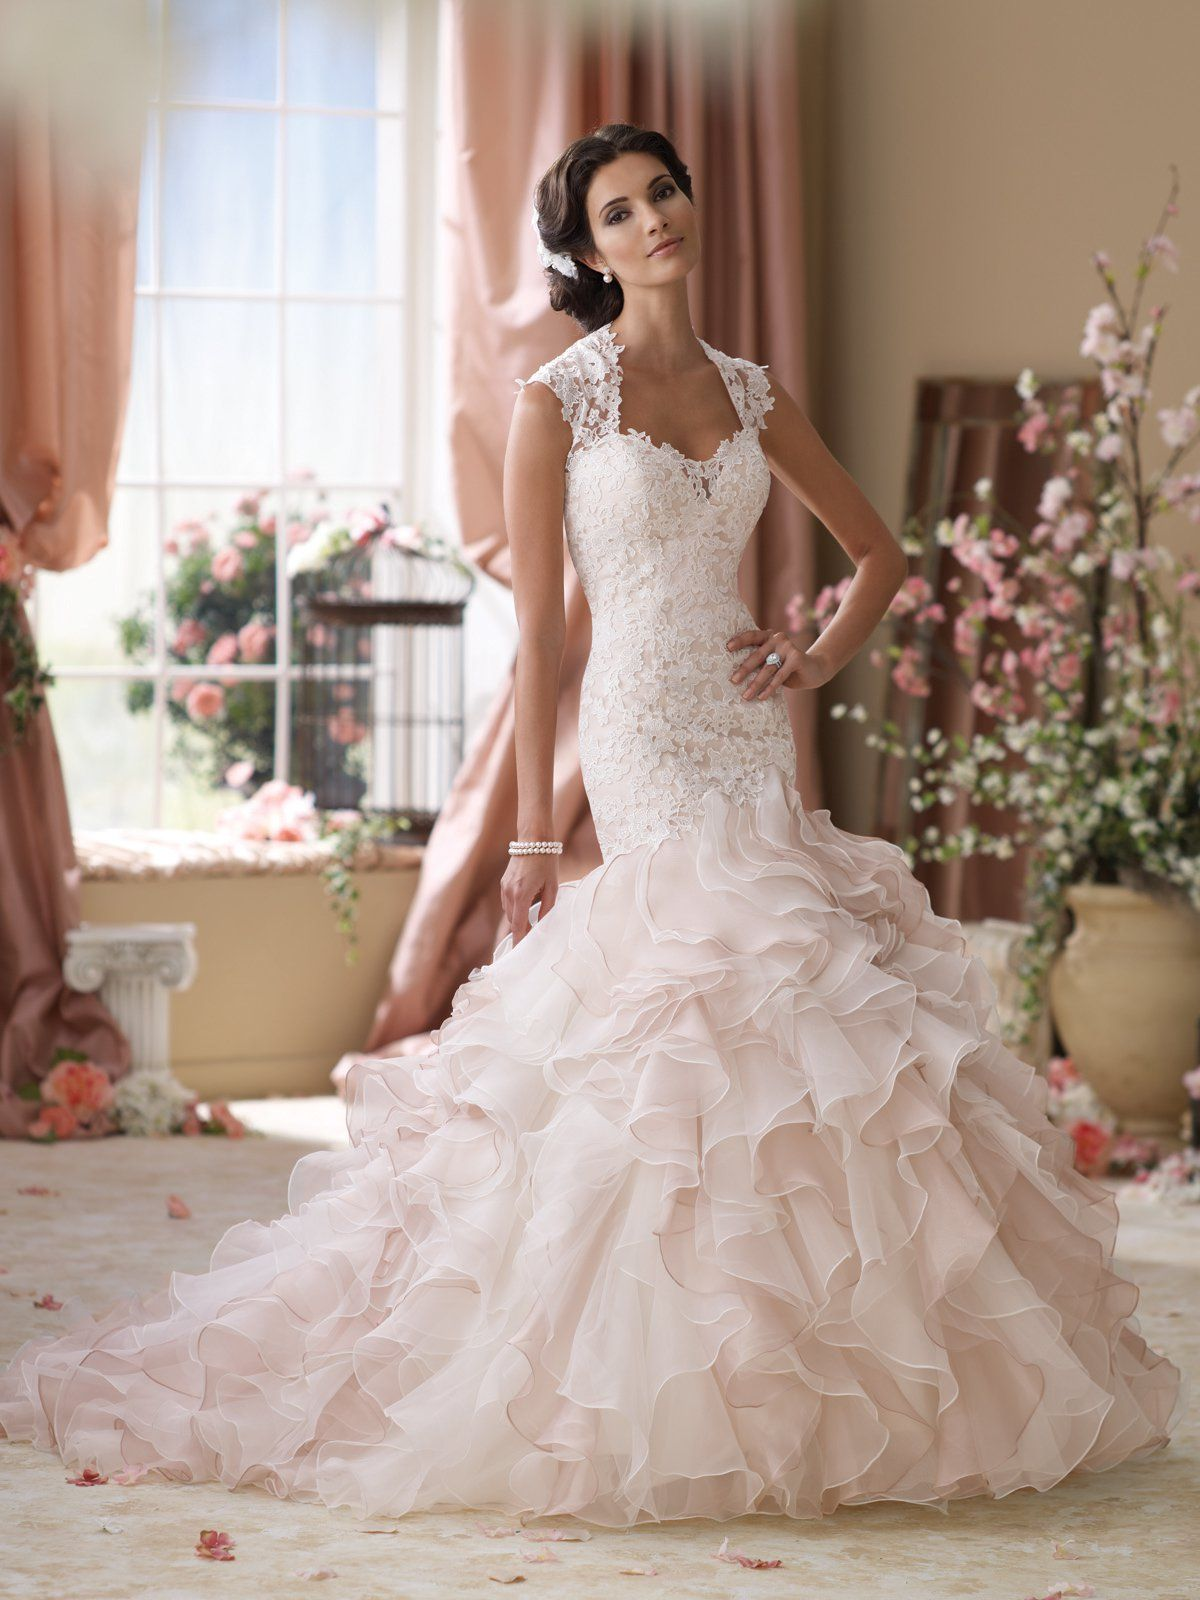 36 Most Stunning Wedding Dresses of 2015 | Wedding, Dress ideas and ...